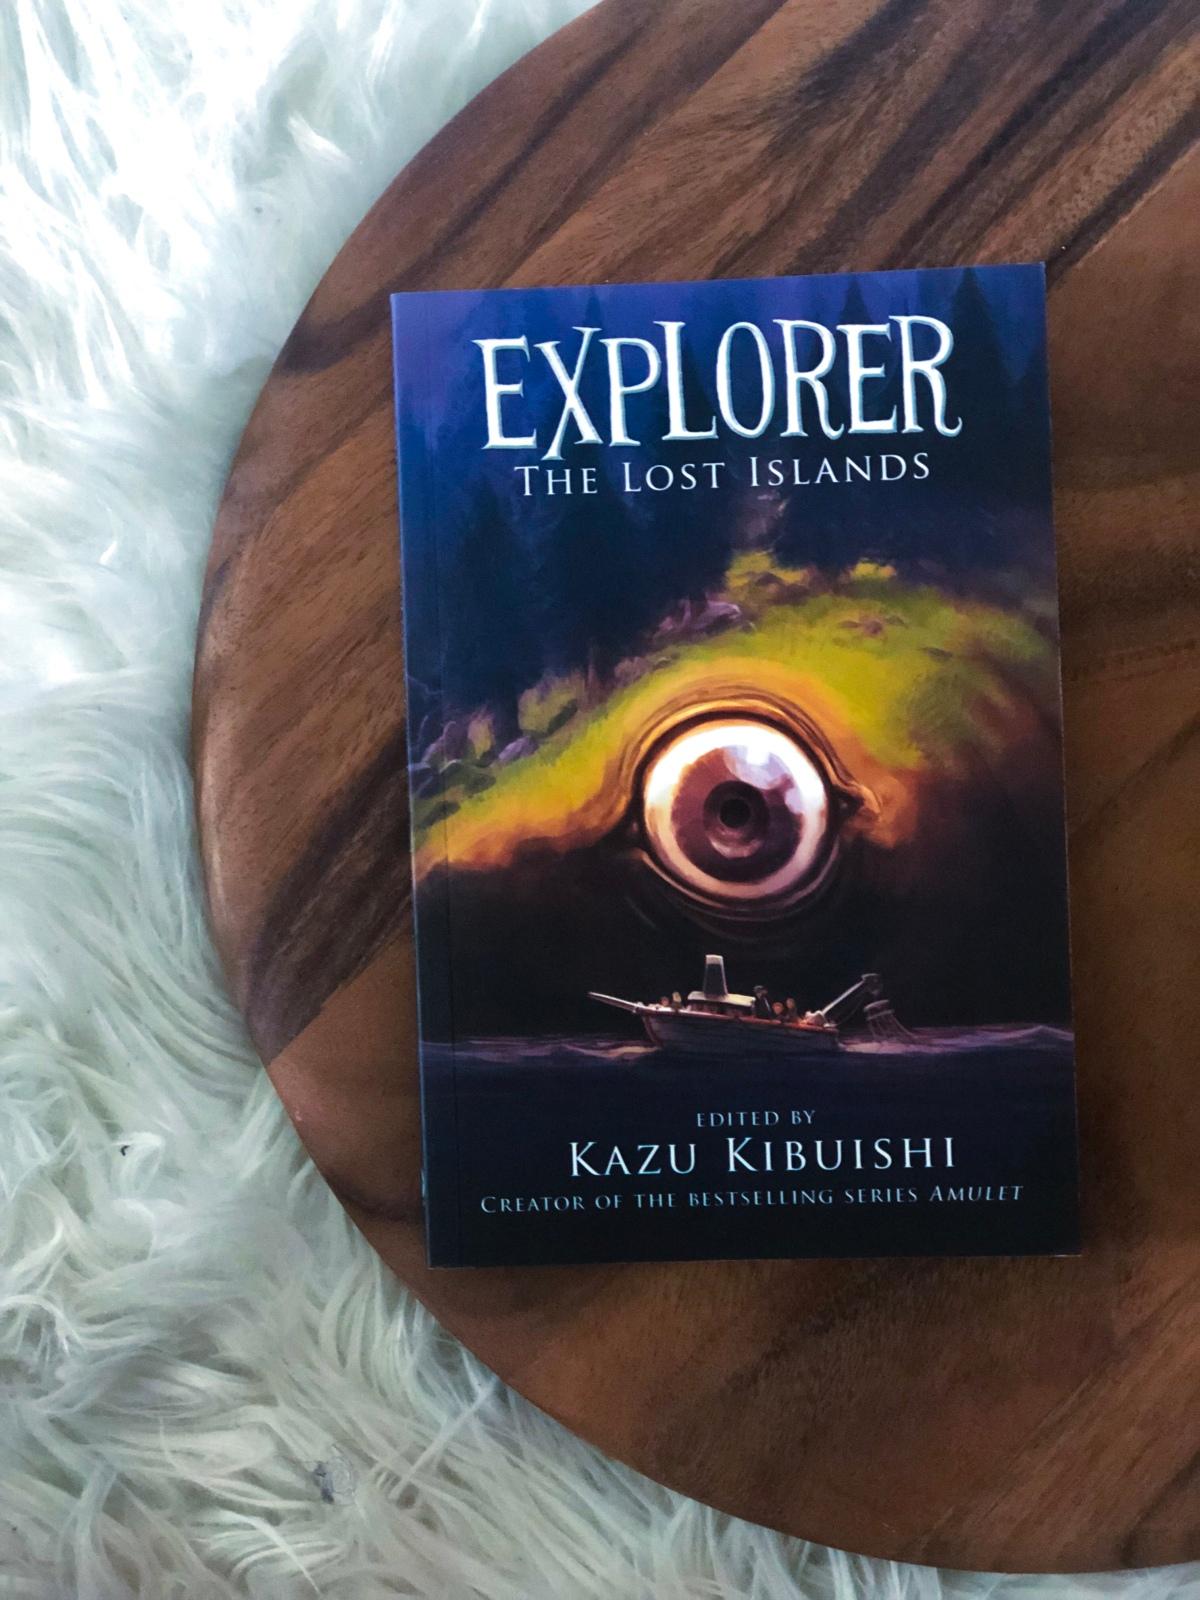 Review: 'Explorer' Series Edited By KazuKibuishi